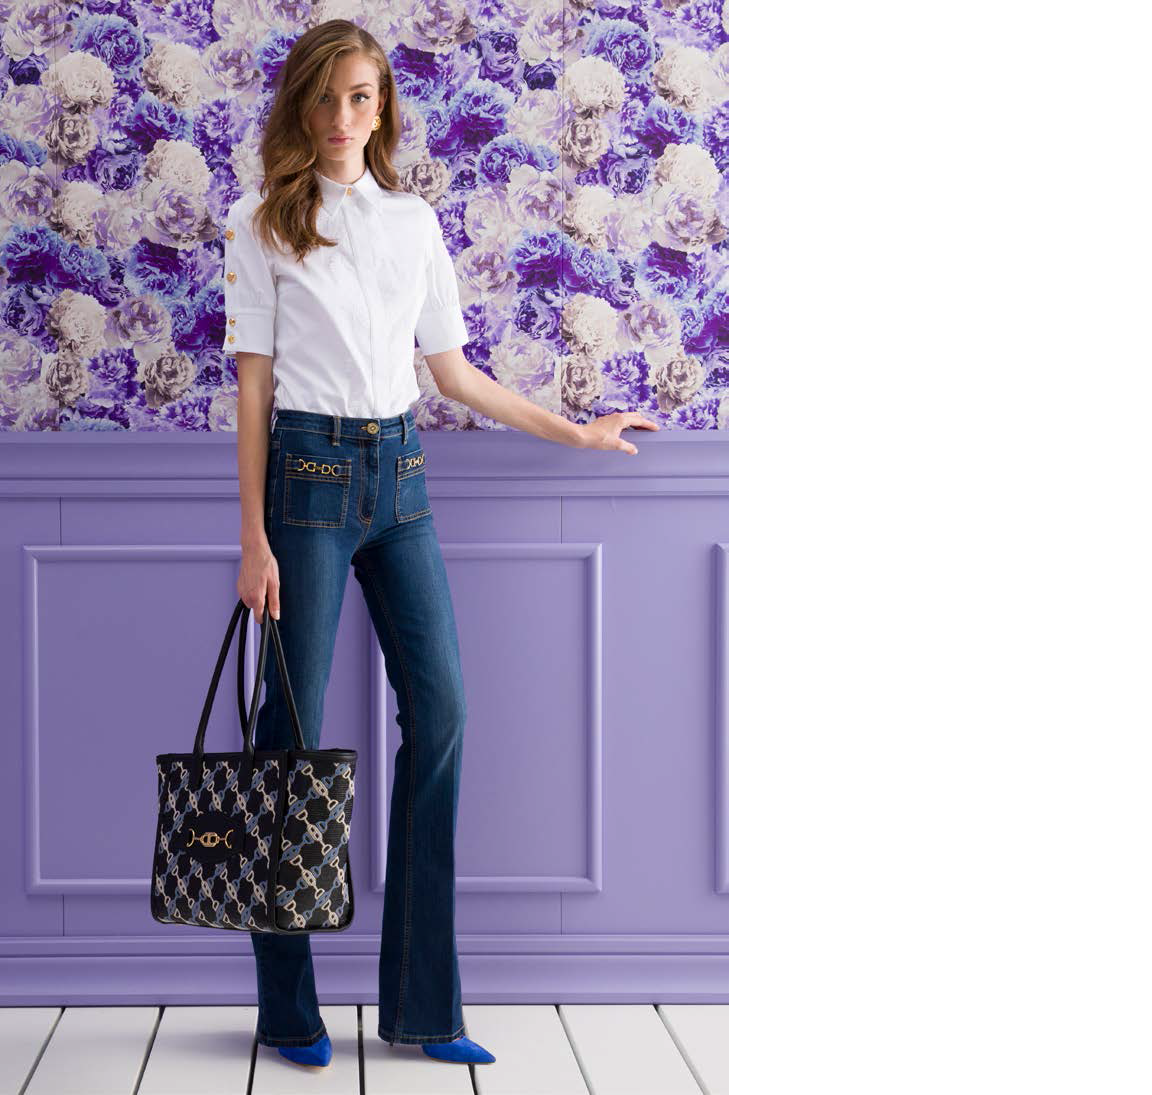 48-Tasche-Jeans-Hose